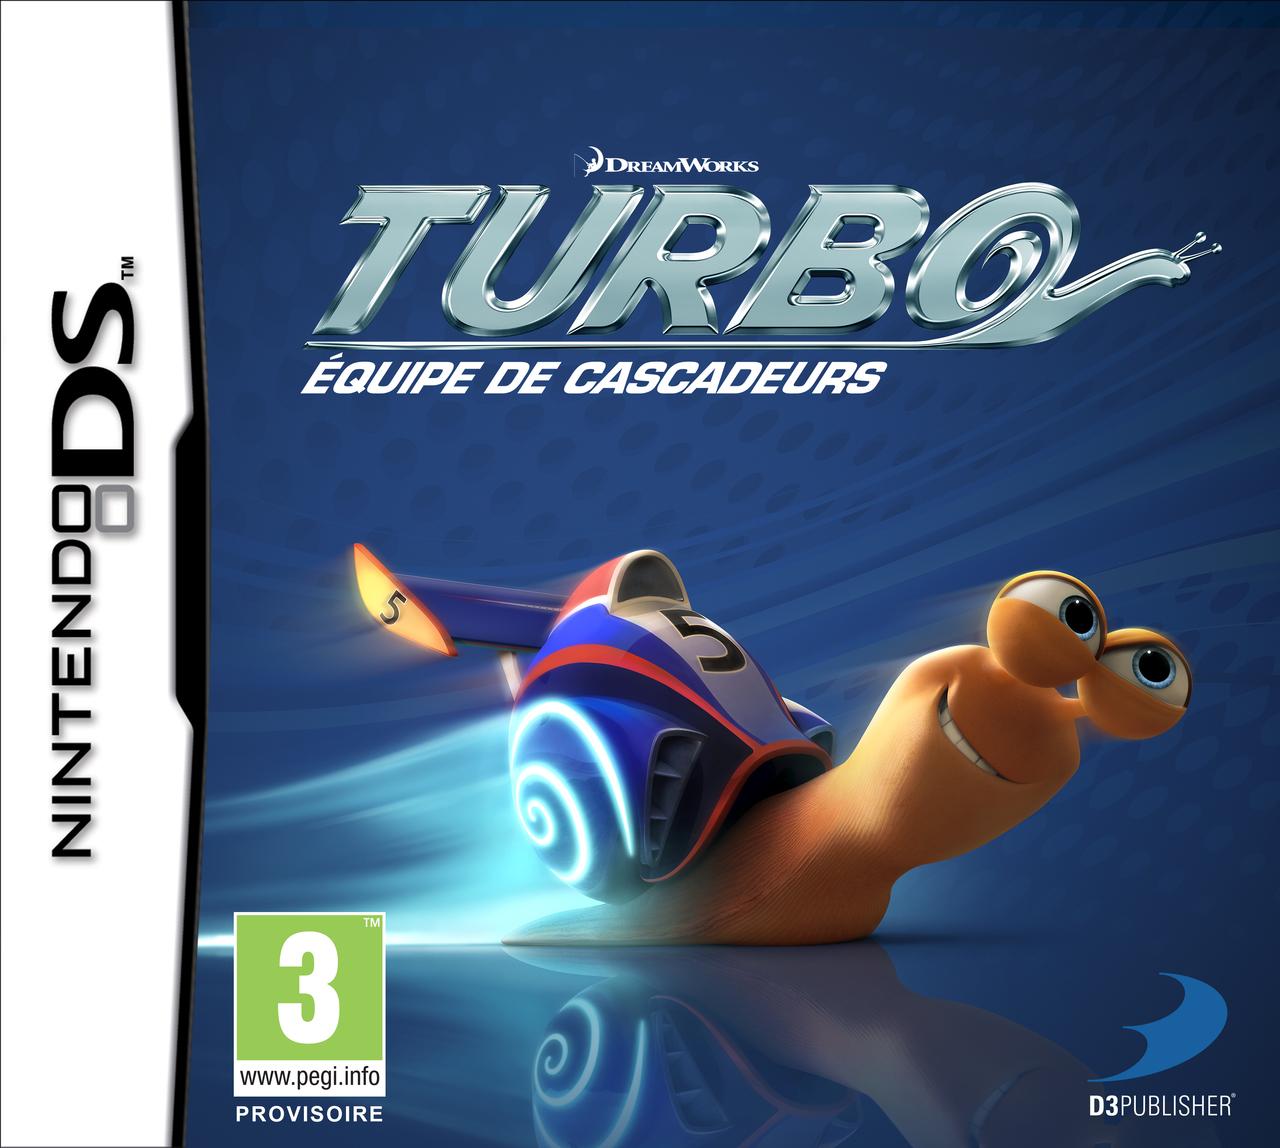 Turbo : Equipe de Cascadeurs [Nintendo DS] [EUR] [MULTiLANGUES]